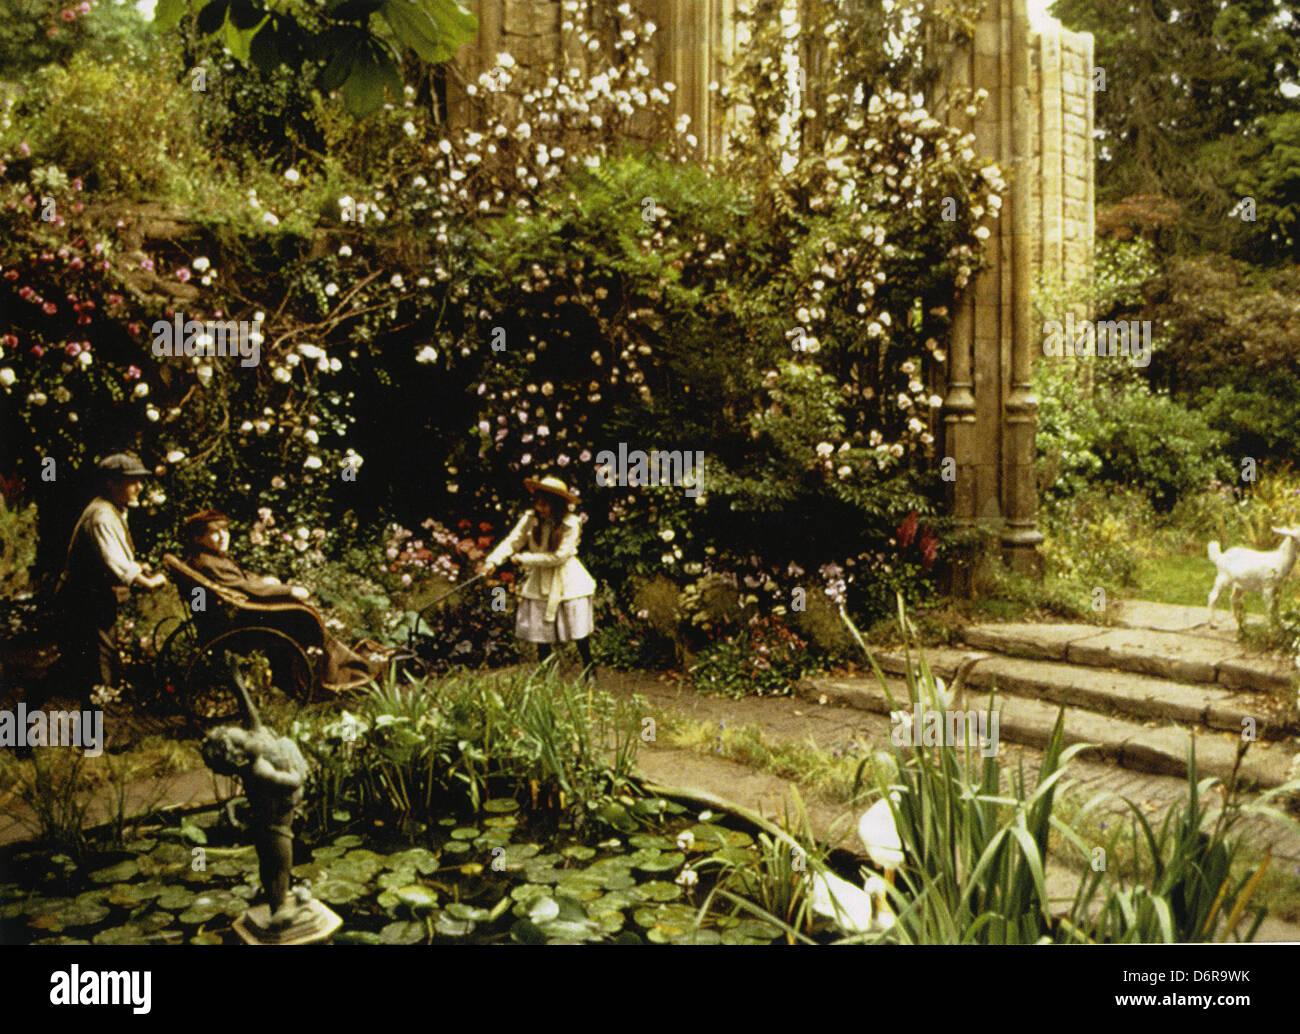 the secret garden 1993 warner bros film with kate maberly stock image - Secret Garden Movie